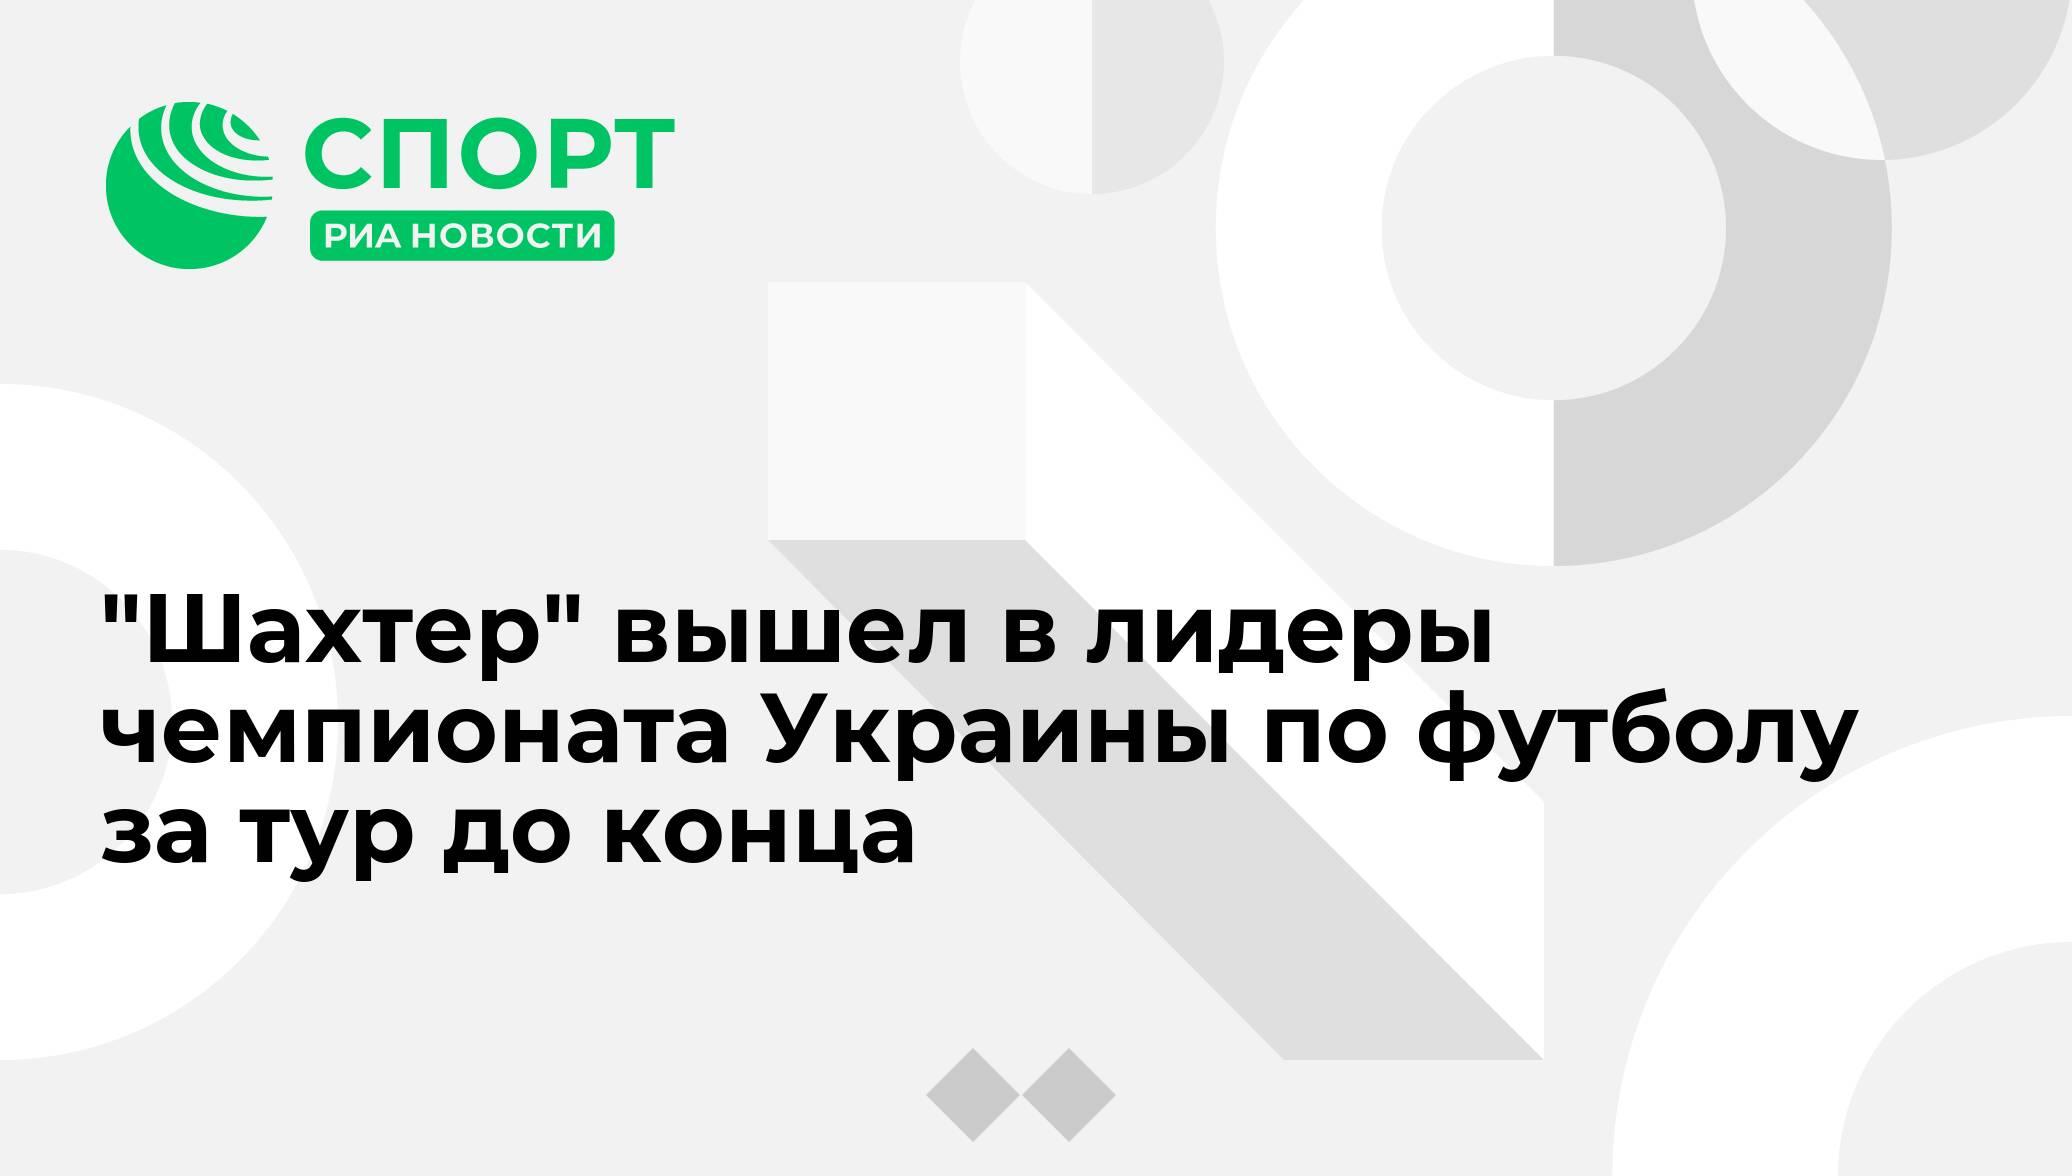 чемпионат украины по футболу шахтер металлист